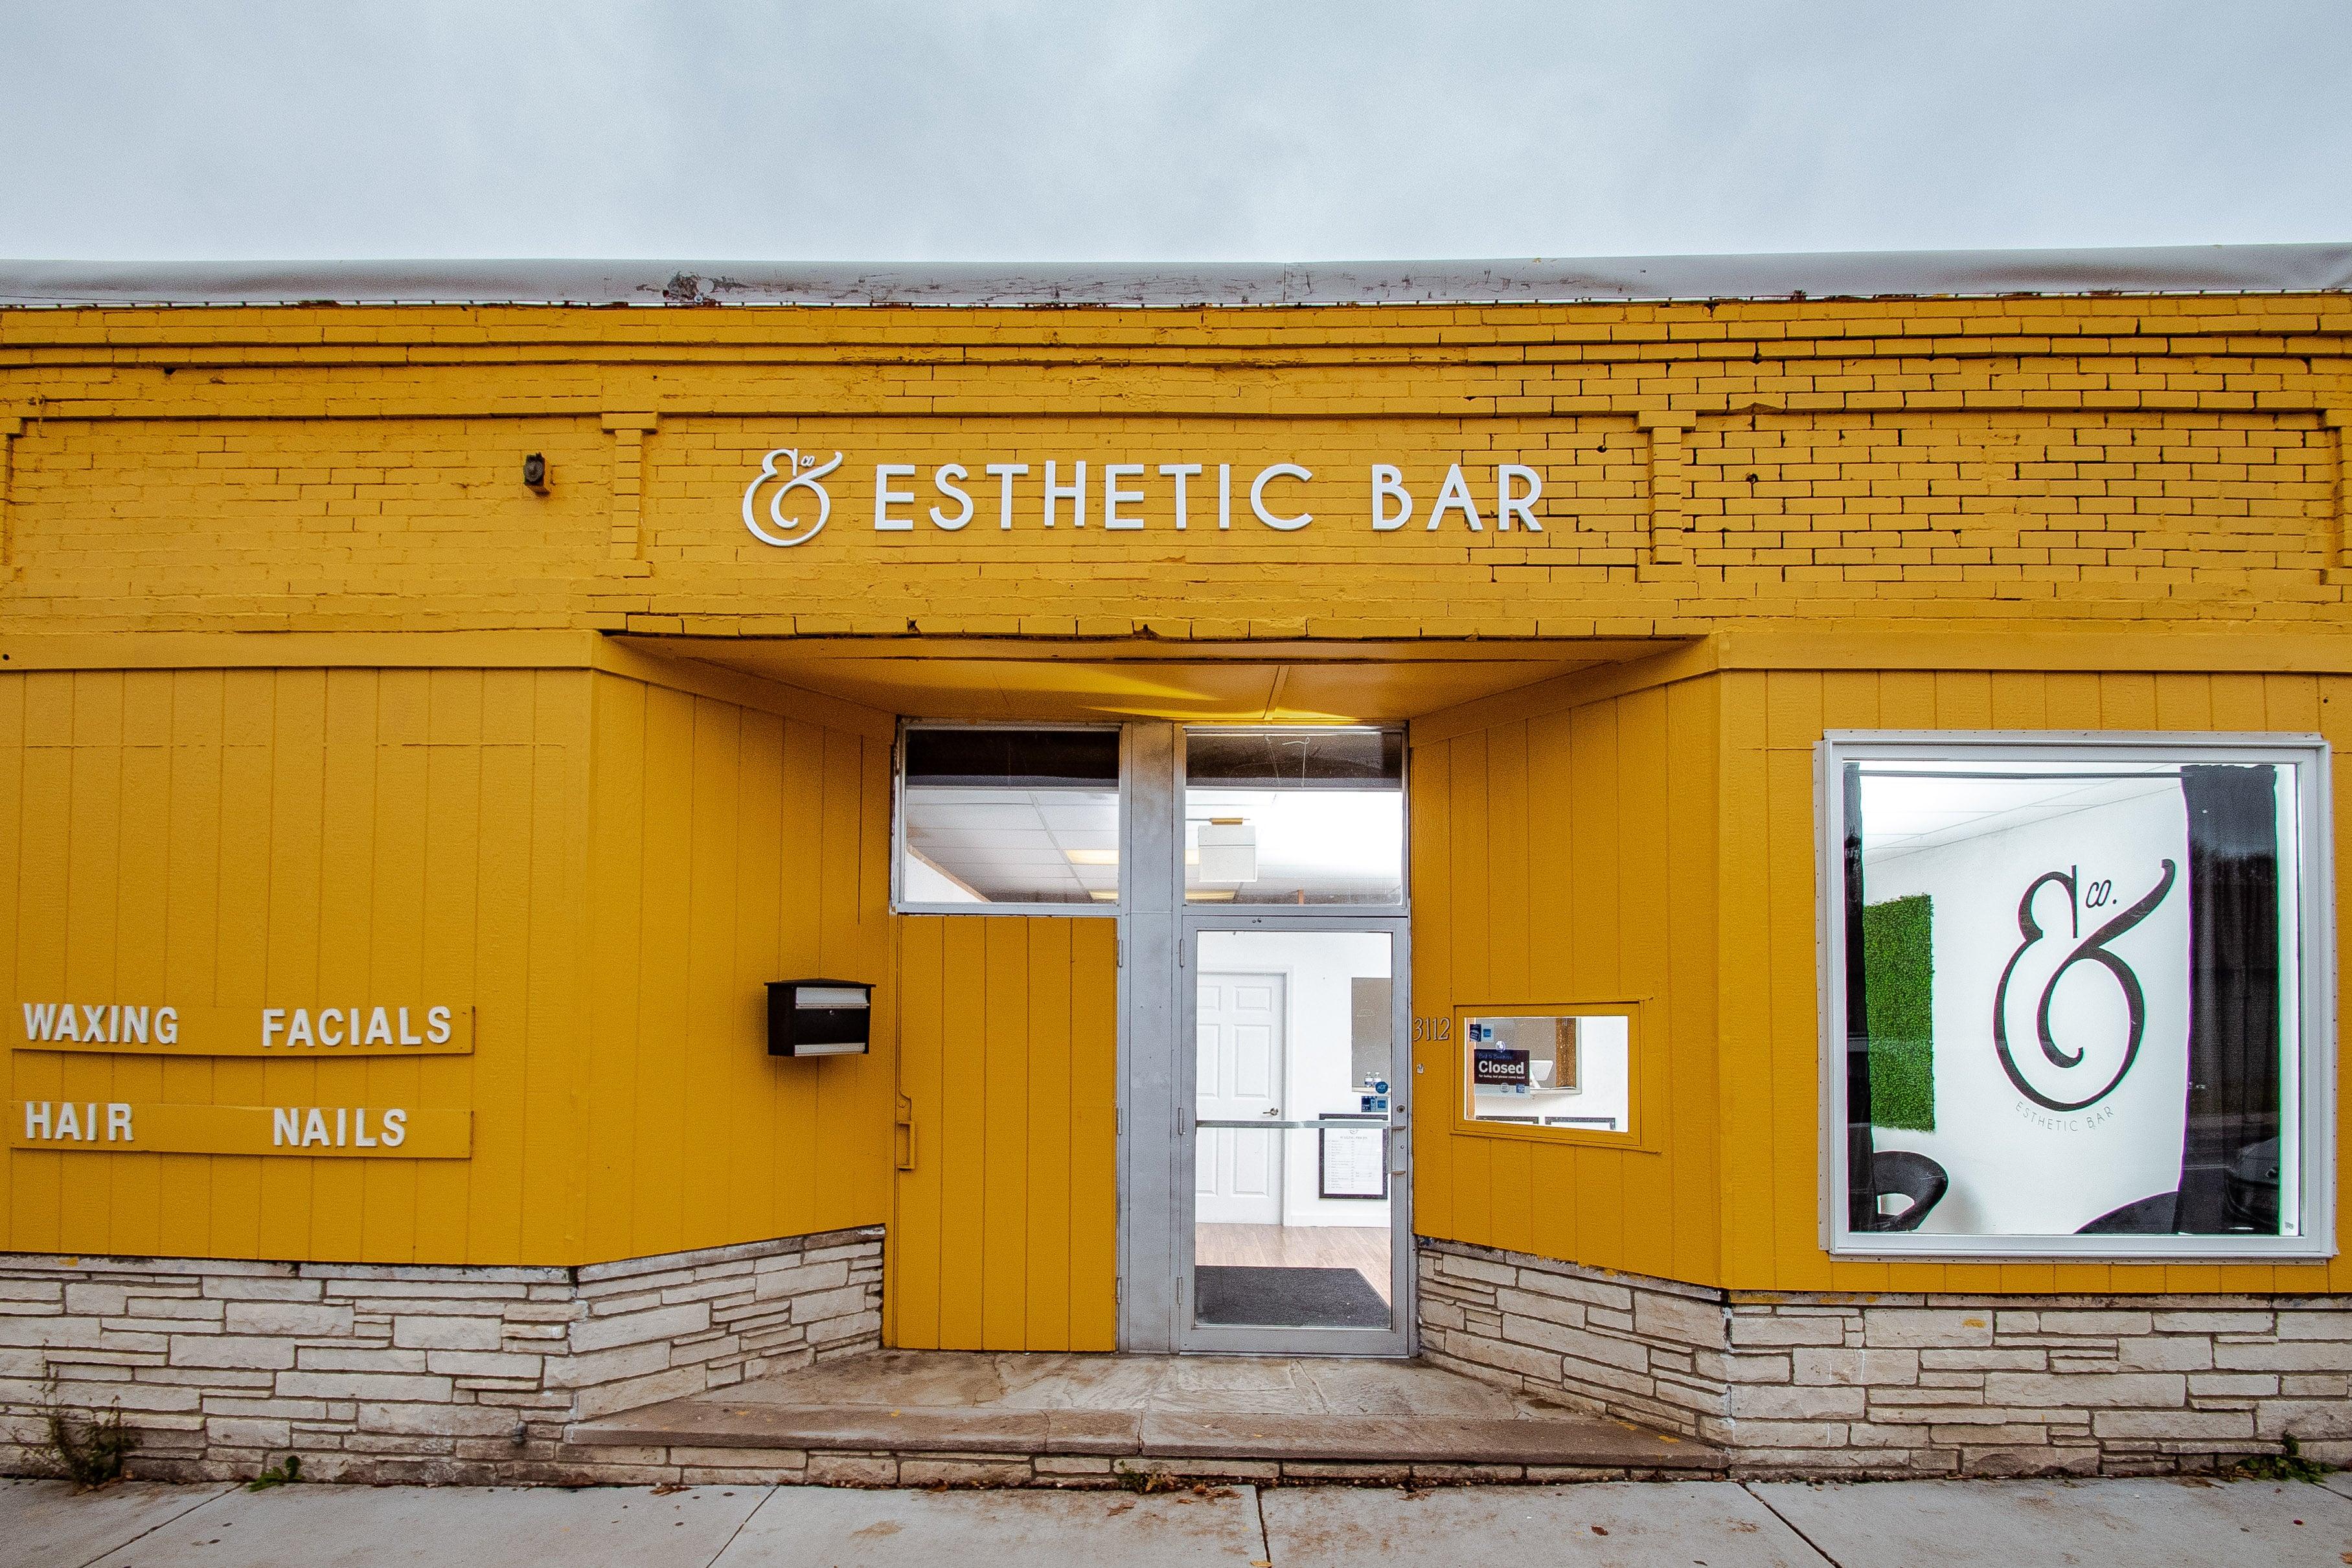 & Company Esthetic Bar storefront